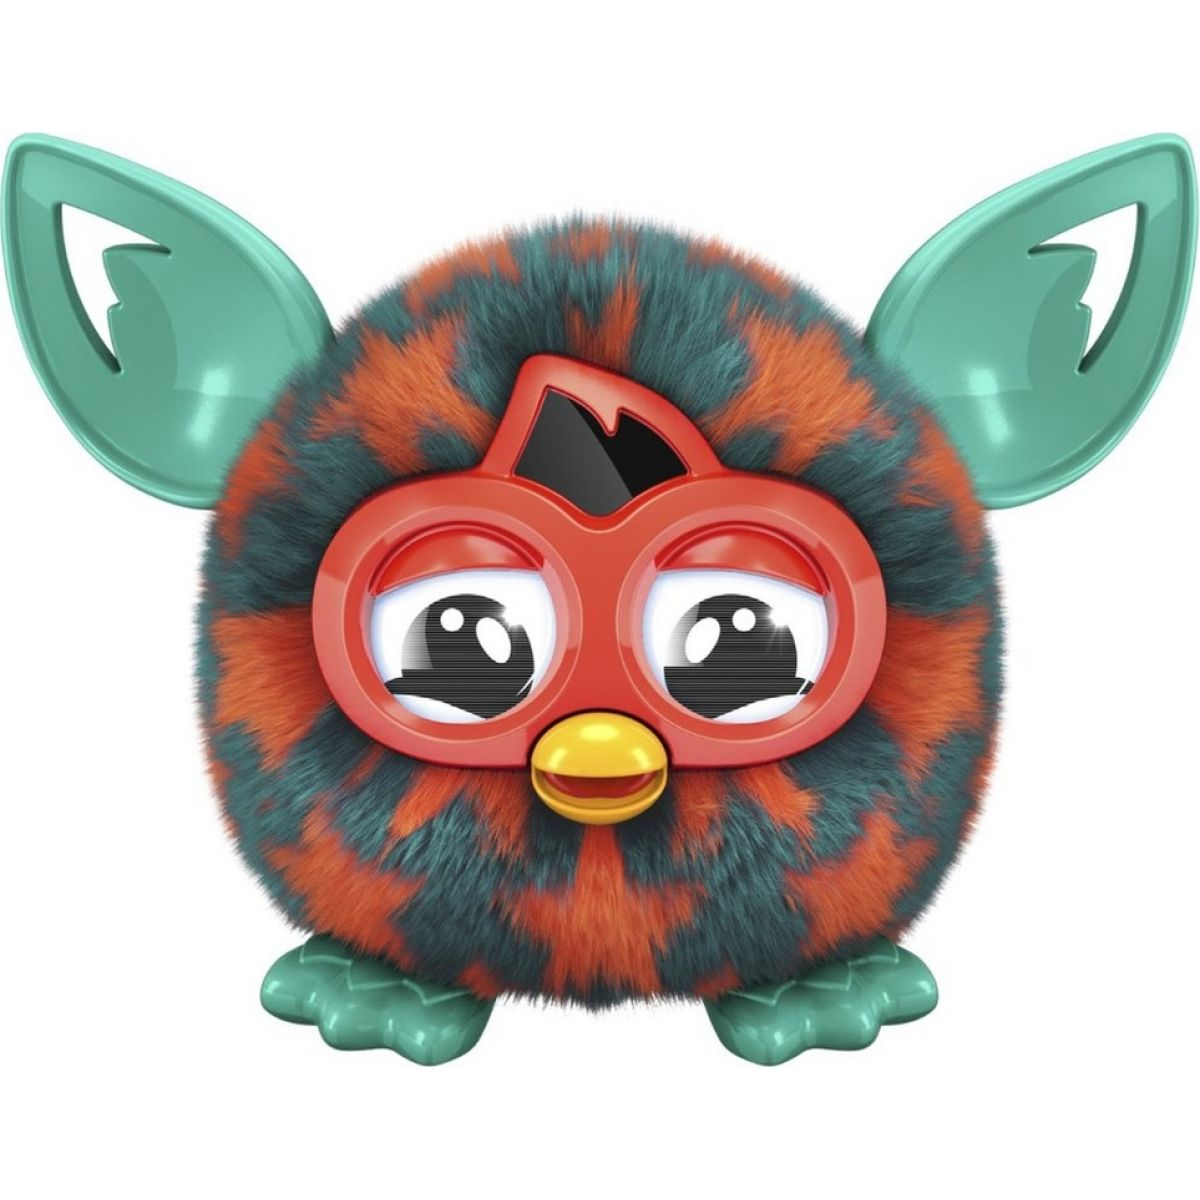 Furby Furblings - Poškozený obal